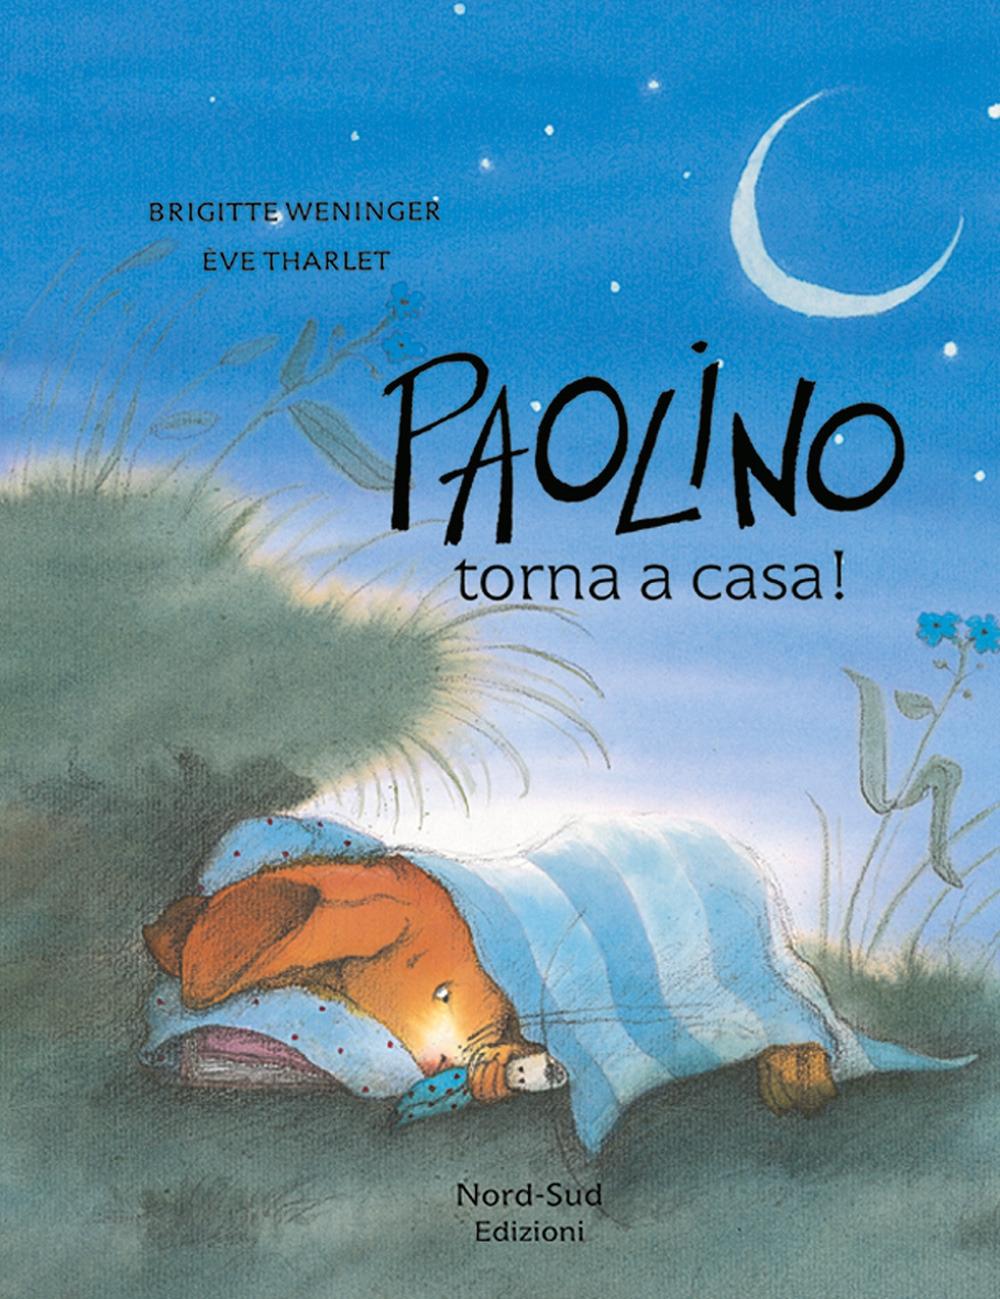 Paolino, torna a casa!.